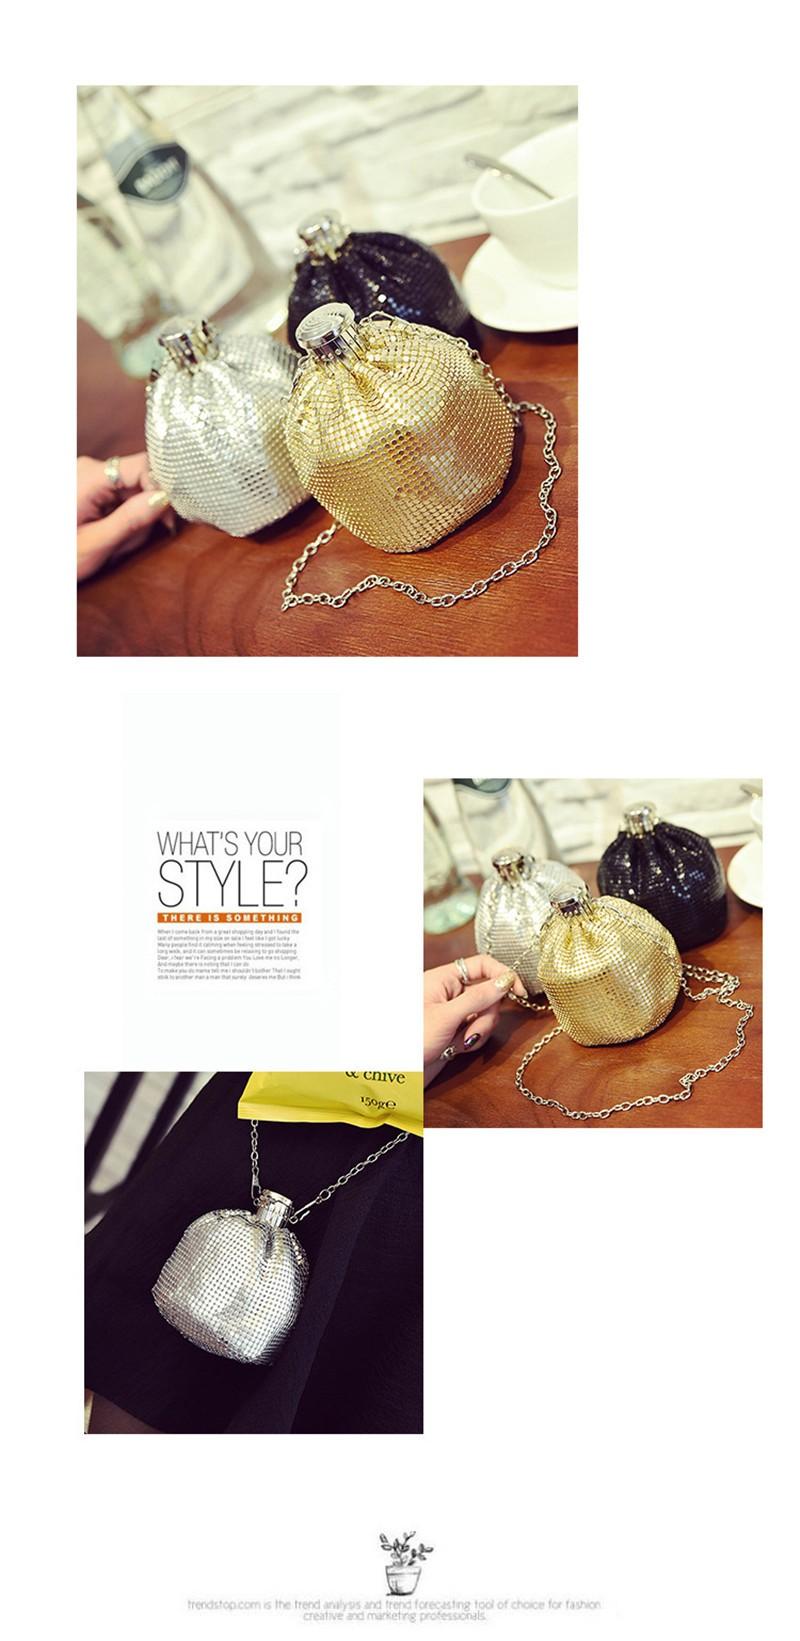 New-Shape-Hip-Flask-Bag-Fashion-Chain-Bucket-Personality-Single-Shoulder-Handbag-Women-Cross-Body-BAGS-SS0204 (14)